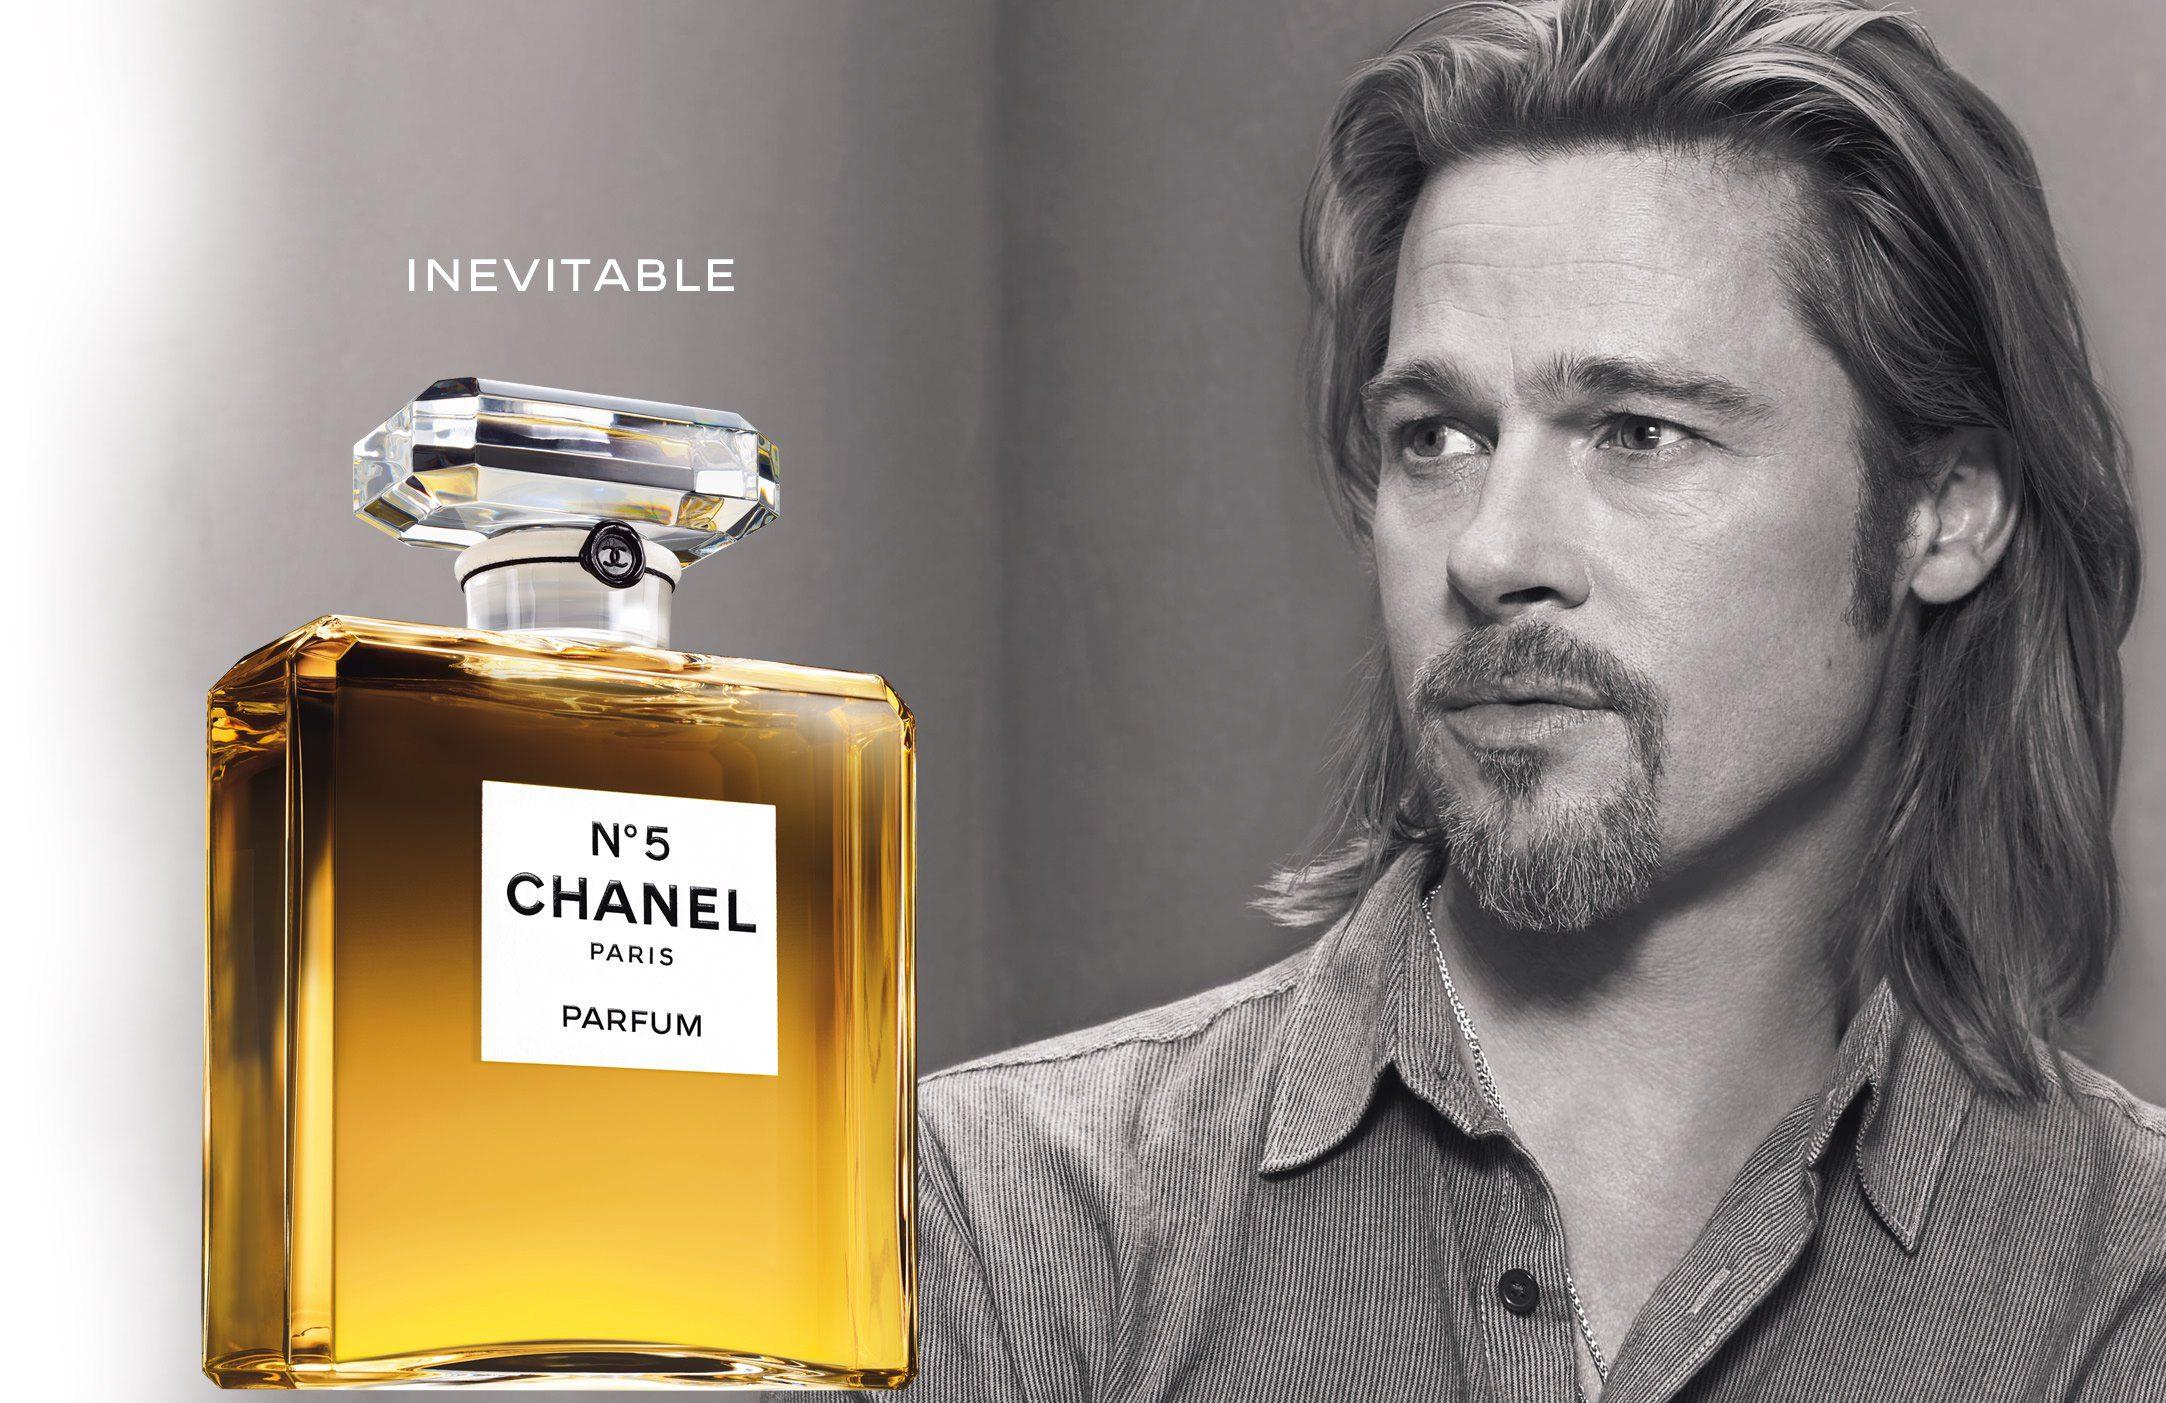 Brad-Pitt-Chanel-No 5 Celebrity endorsement, The Myndset Digital Marketing